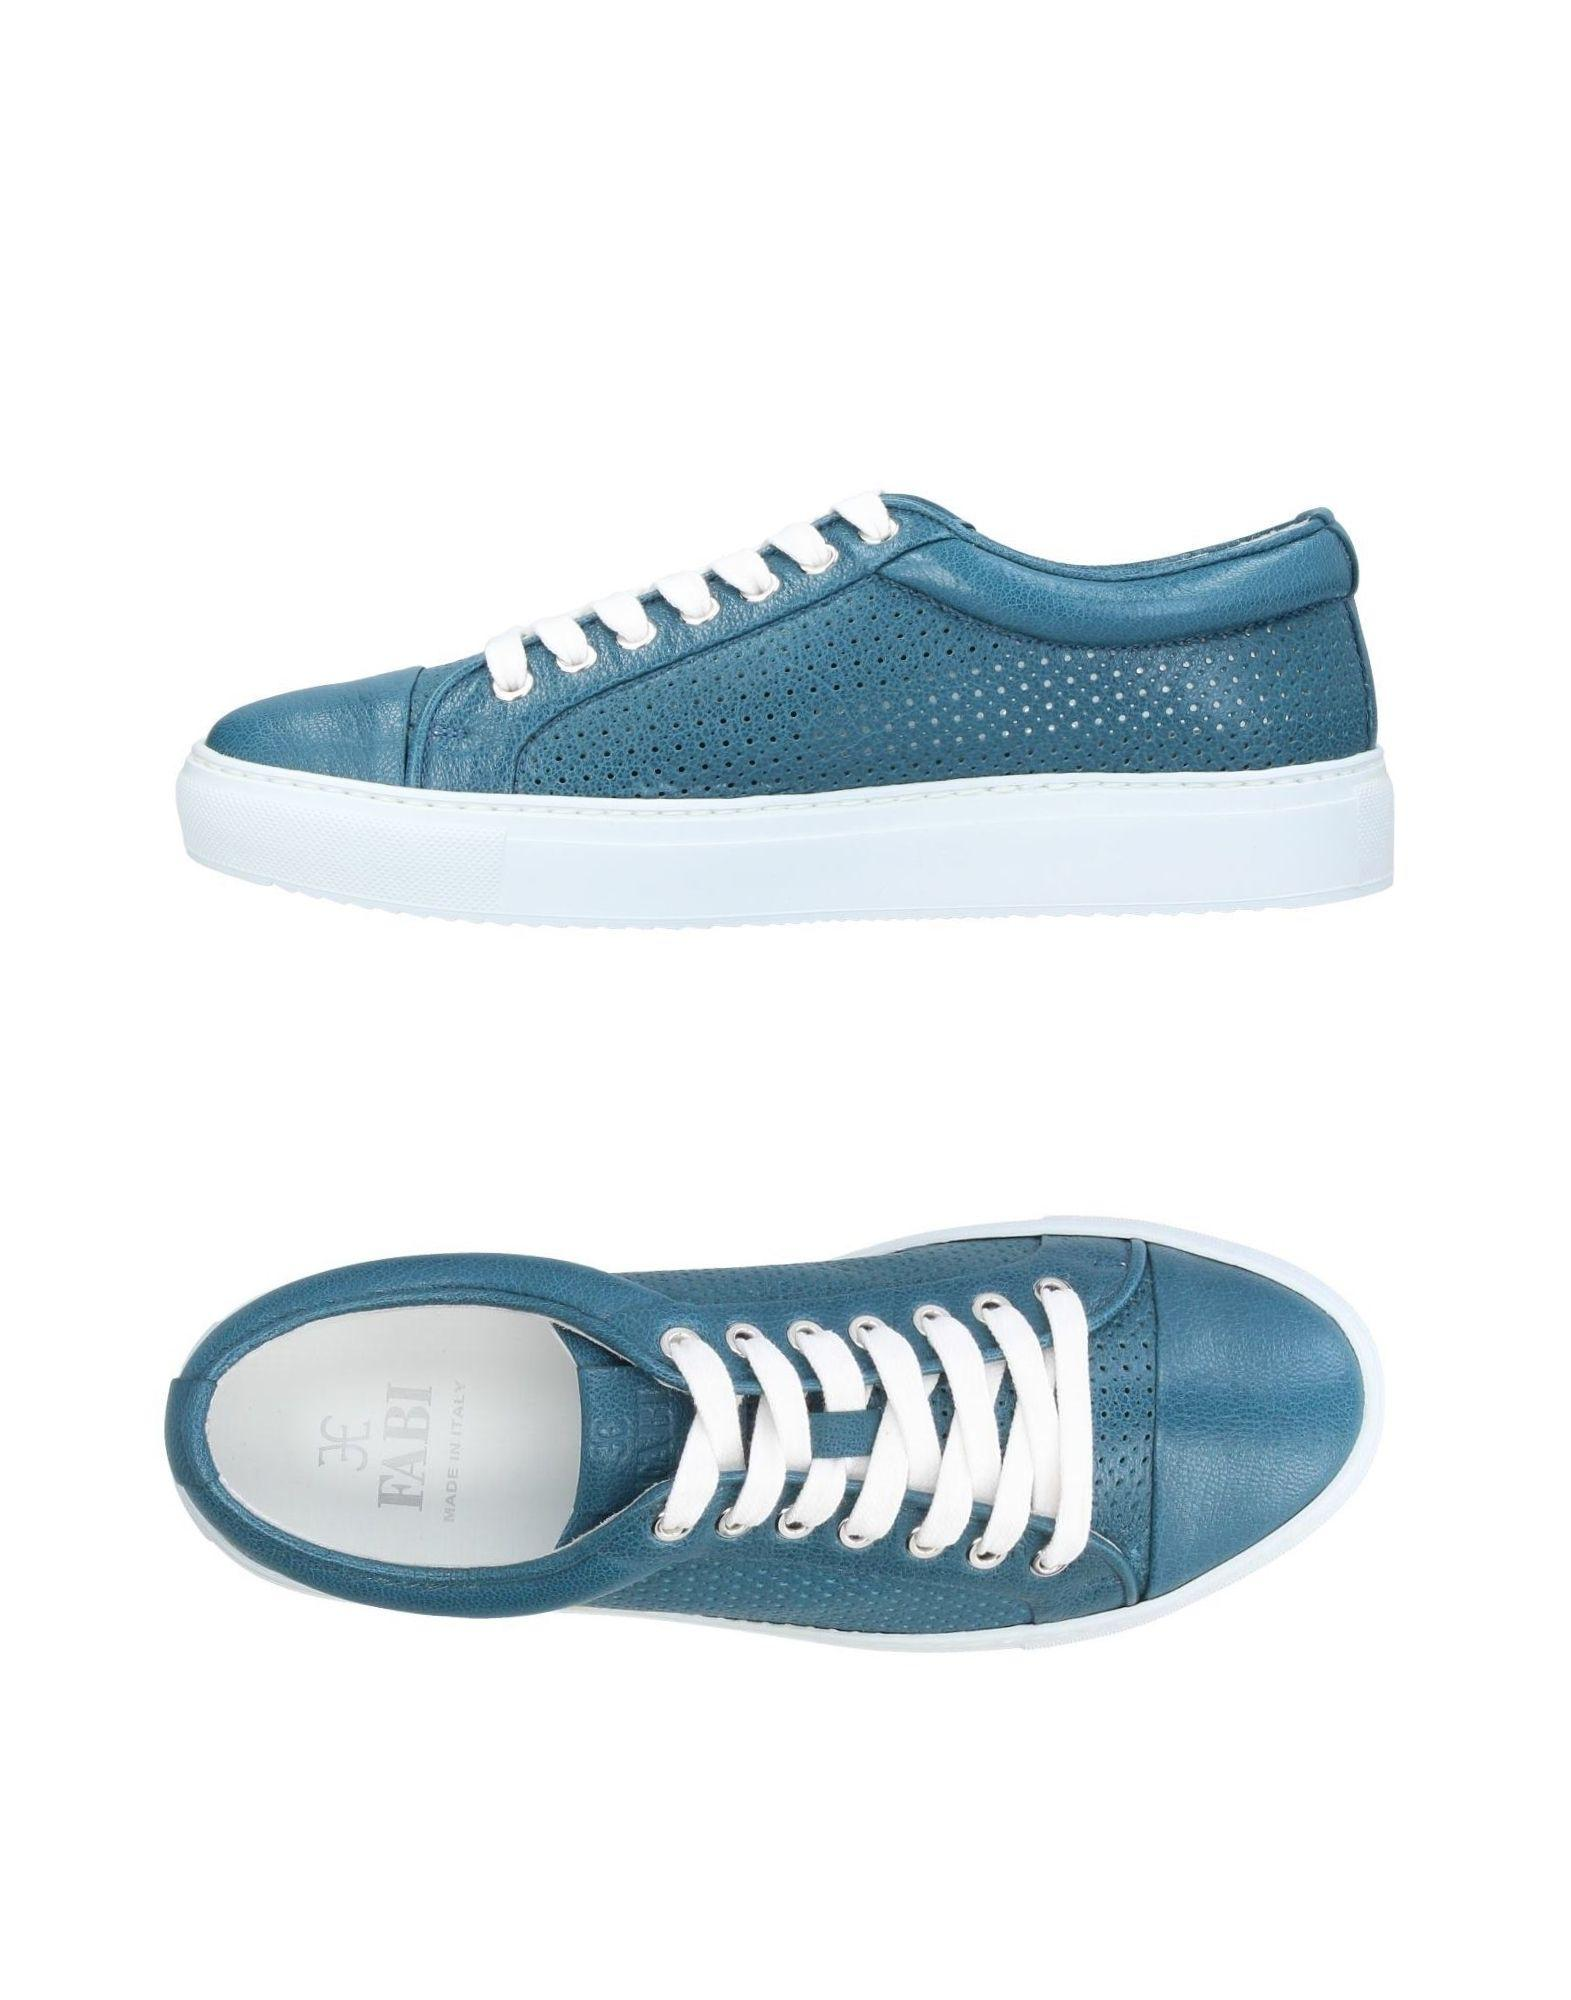 buy cheap enjoy buy cheap best prices Fabi low top sneakers 2woBnL